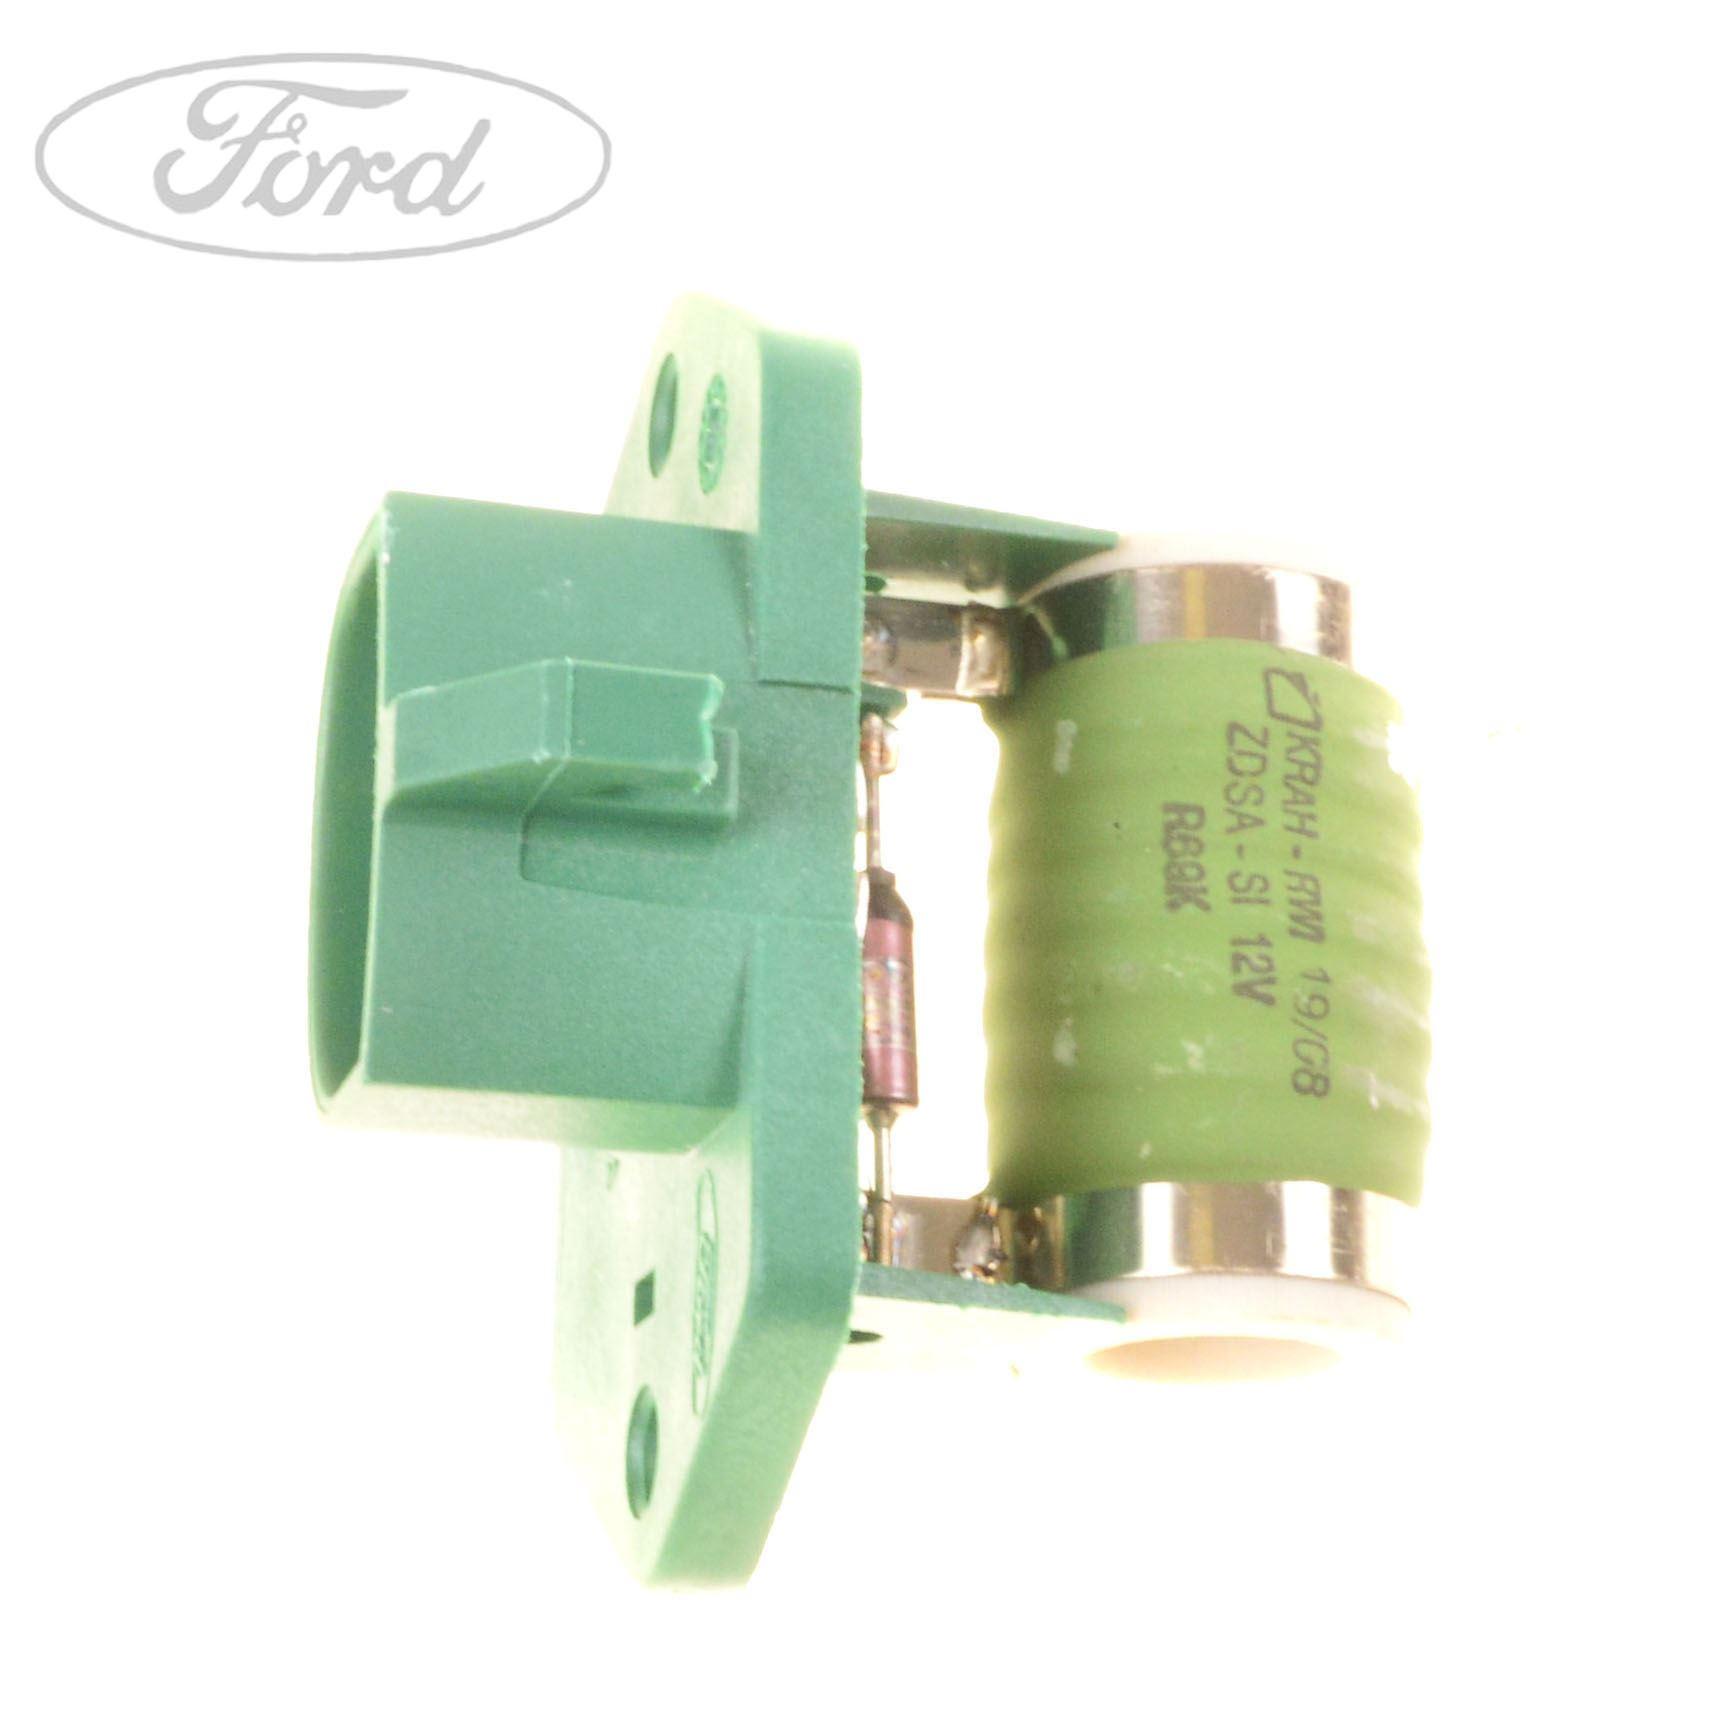 hight resolution of details about genuine ford fiesta mk4 fiesta mk6 fusion heater resistor 1364715